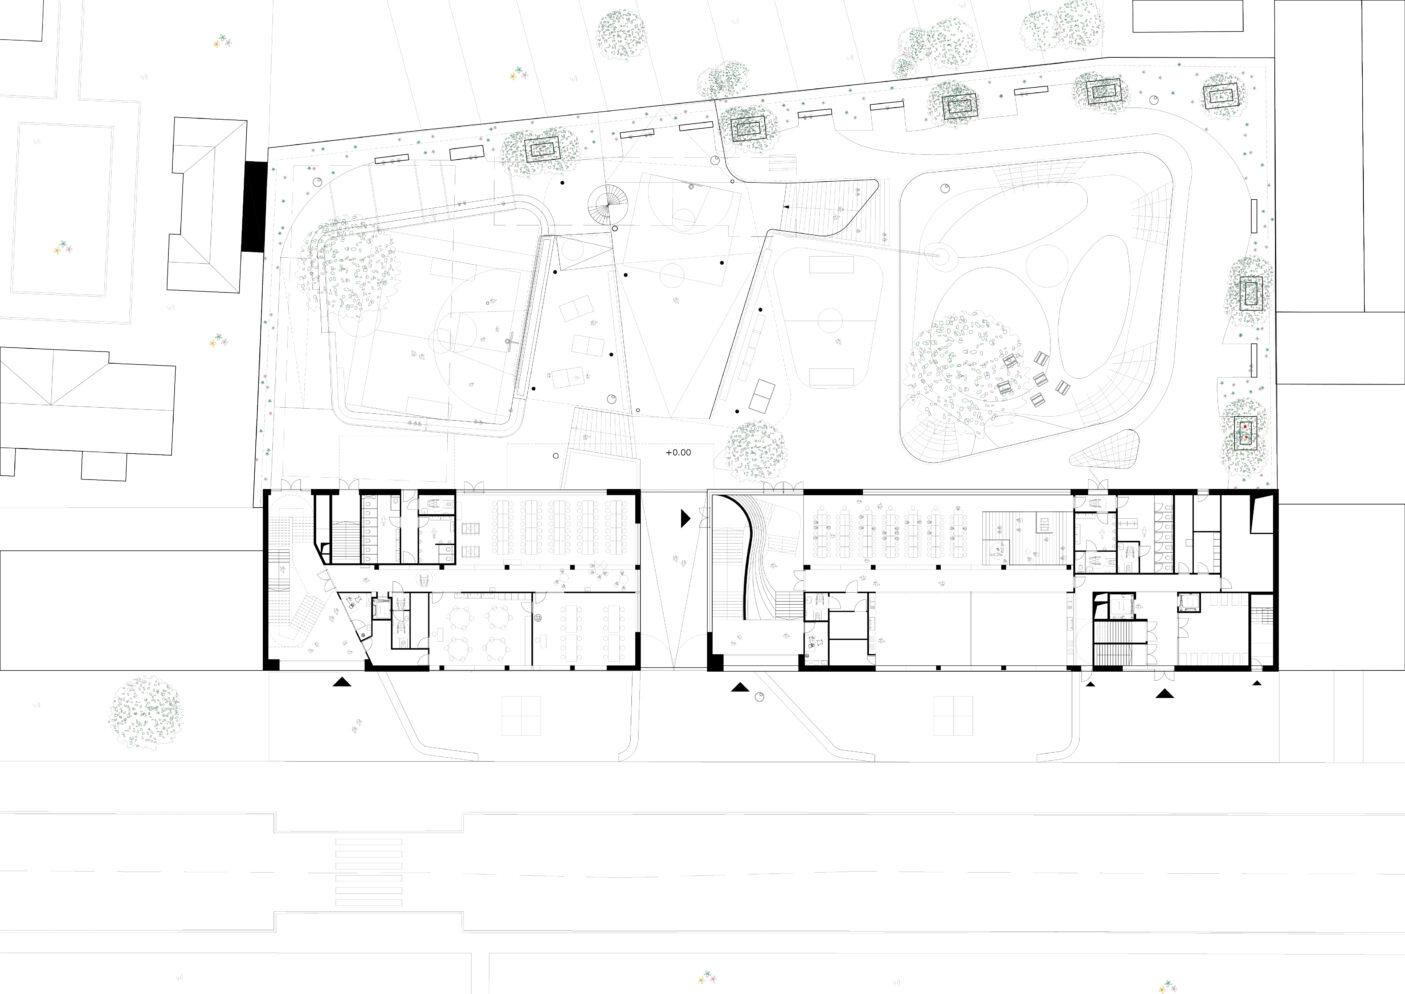 1617-SBXL-PLANNEN-170830-Model-plan-1-scaled.jpg